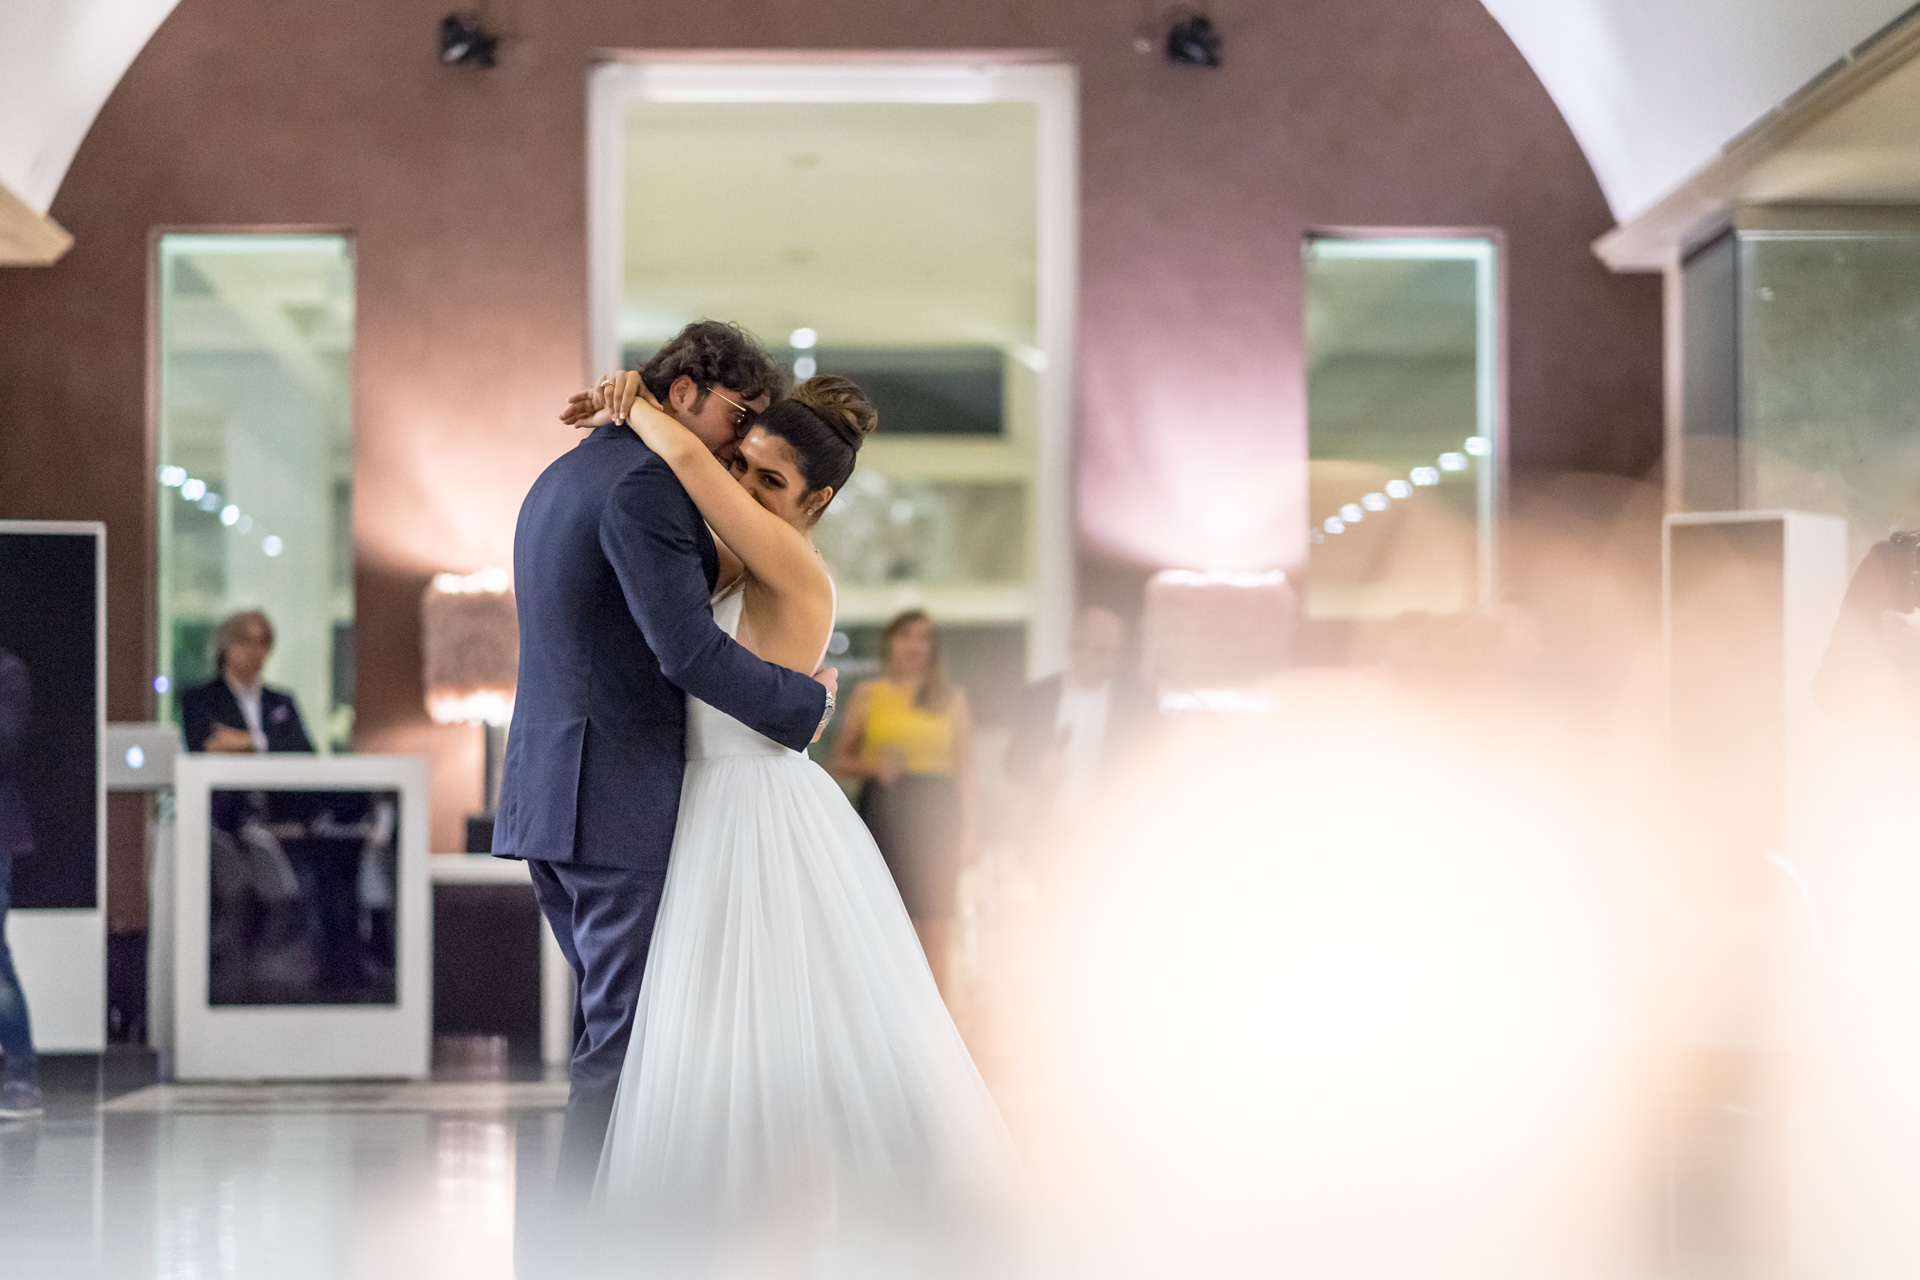 merafina photographer alfonso merafina fotografo wedding matrimonio andria francesca e antonio (24)